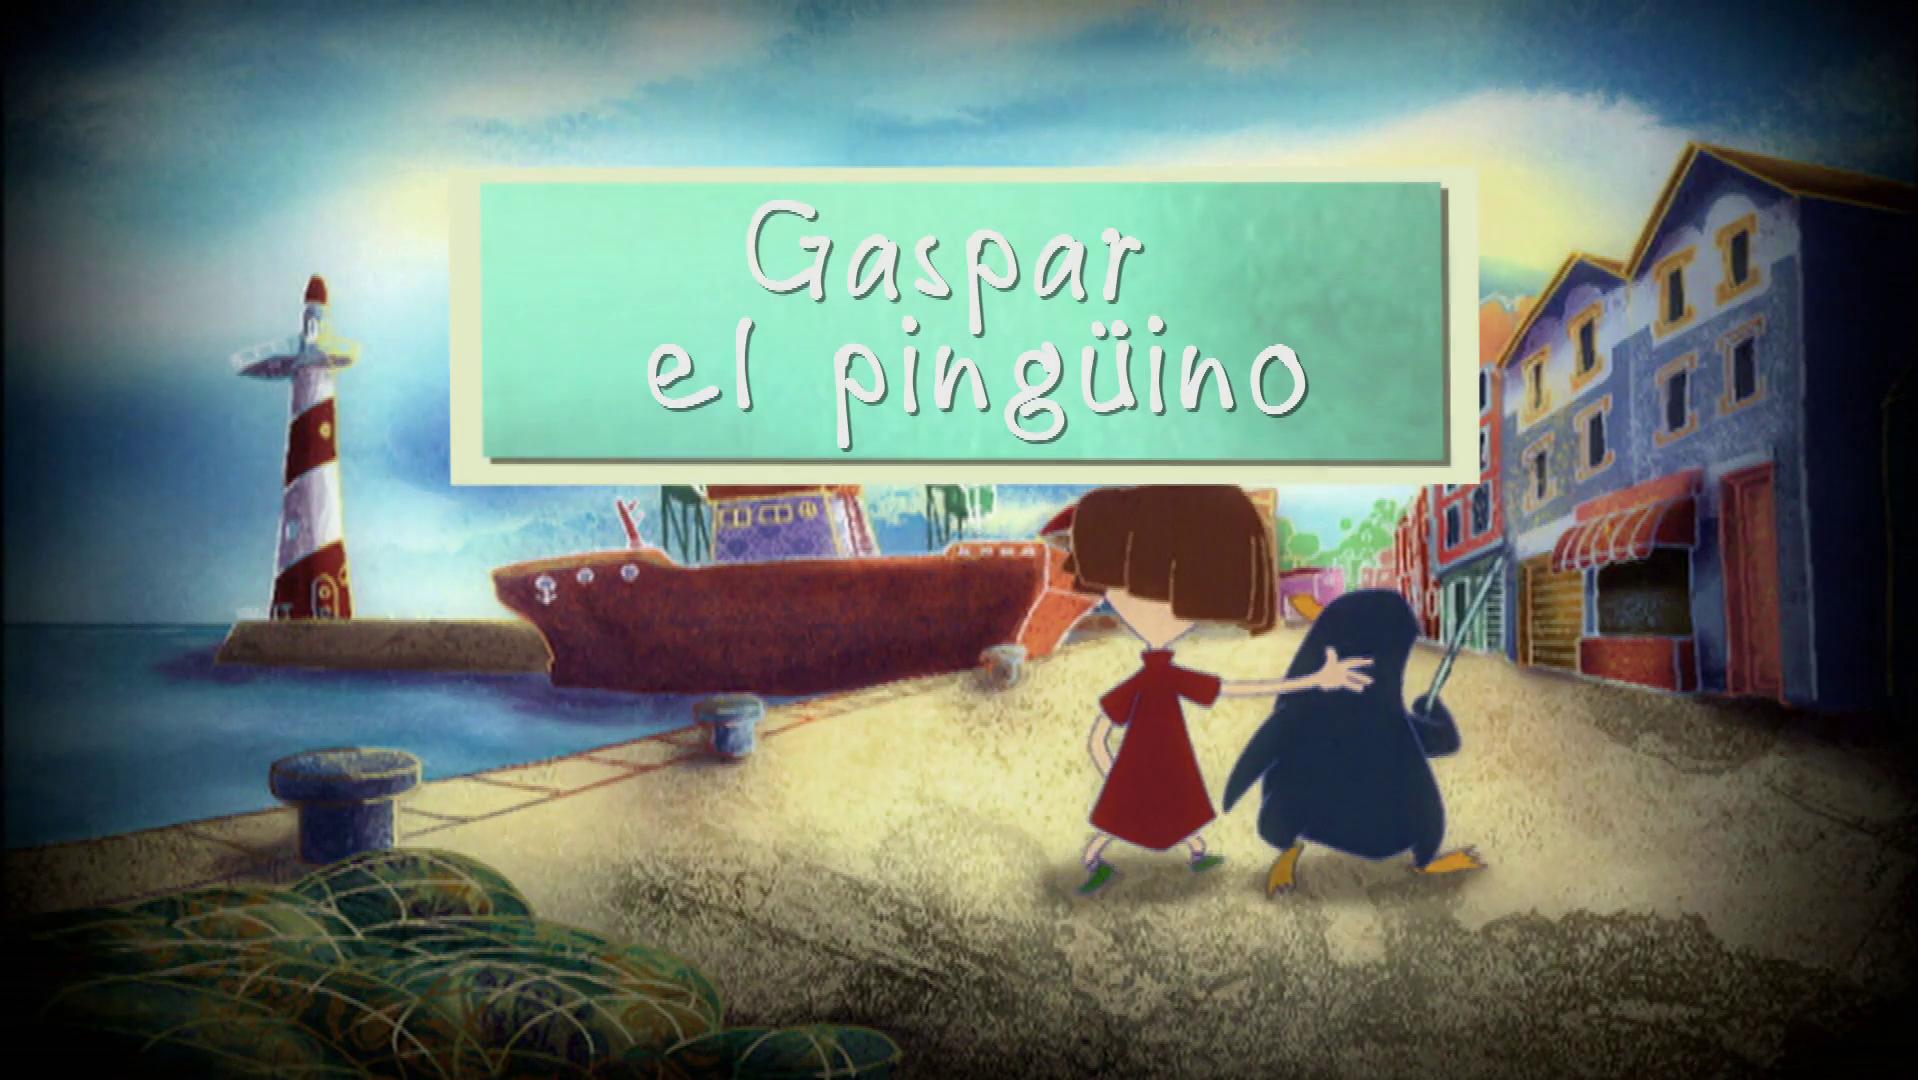 Gaspar, el pingüino